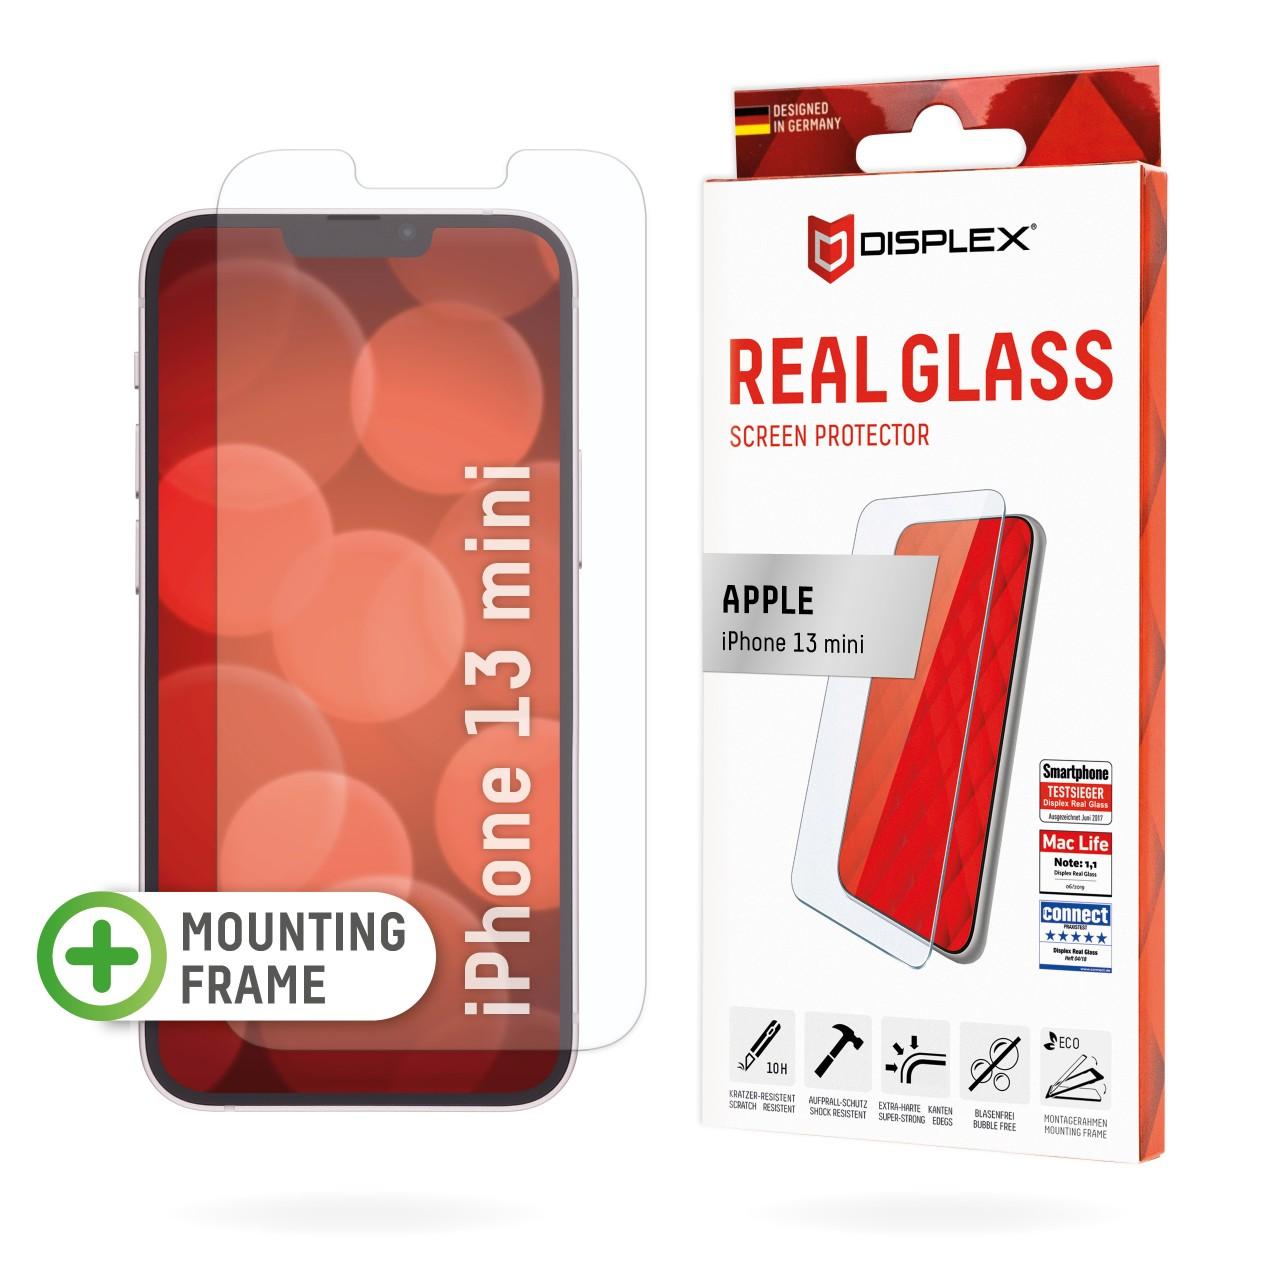 01481-APPLE-iPhone-13-mini-RealGlass-2D-EN7JYMfc1RlYf8E